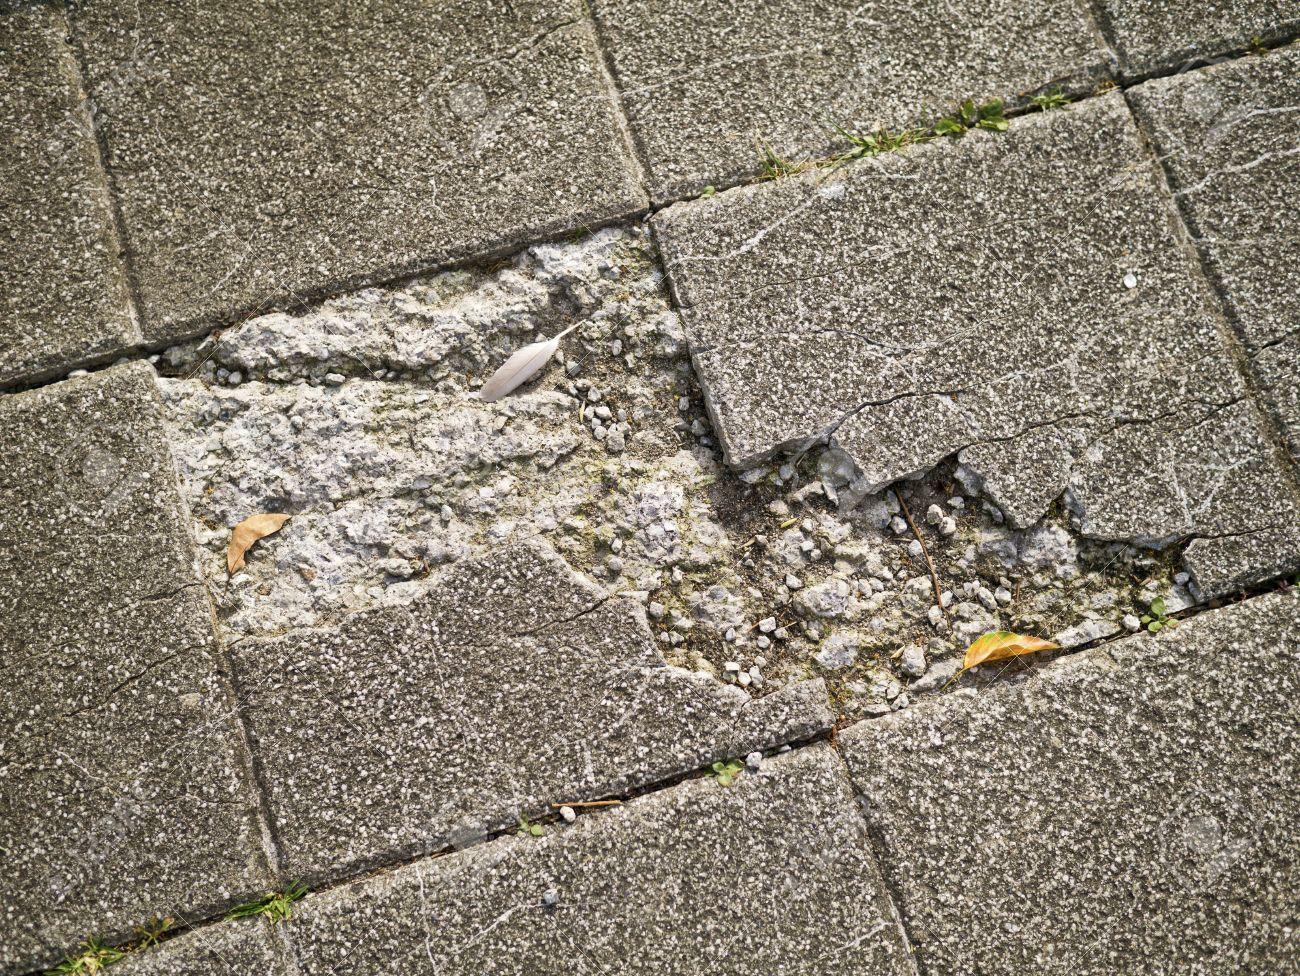 Floor tiles with asbestos gallery tile flooring design ideas asbestos in floor tiles images100 floor tiles asbestos black 100 floor tile with asbestos style basement doublecrazyfo Image collections